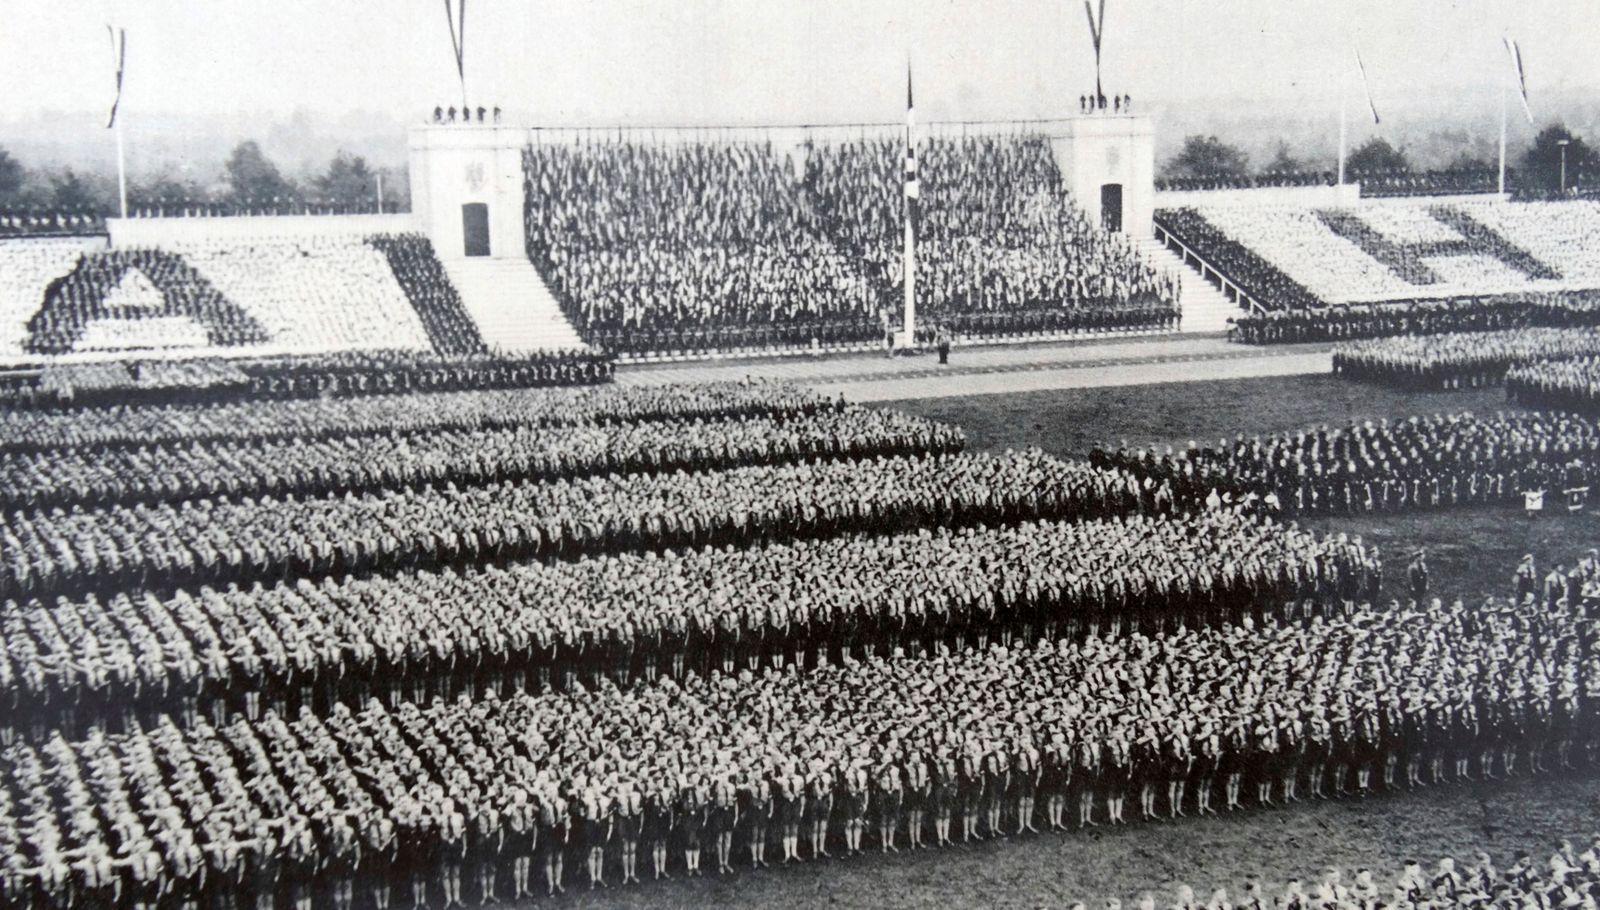 Nazi party Hitler Youth Rally Germany 1937 Nazi party Hitler Youth Rally Germany 1937 PUBLICATIO